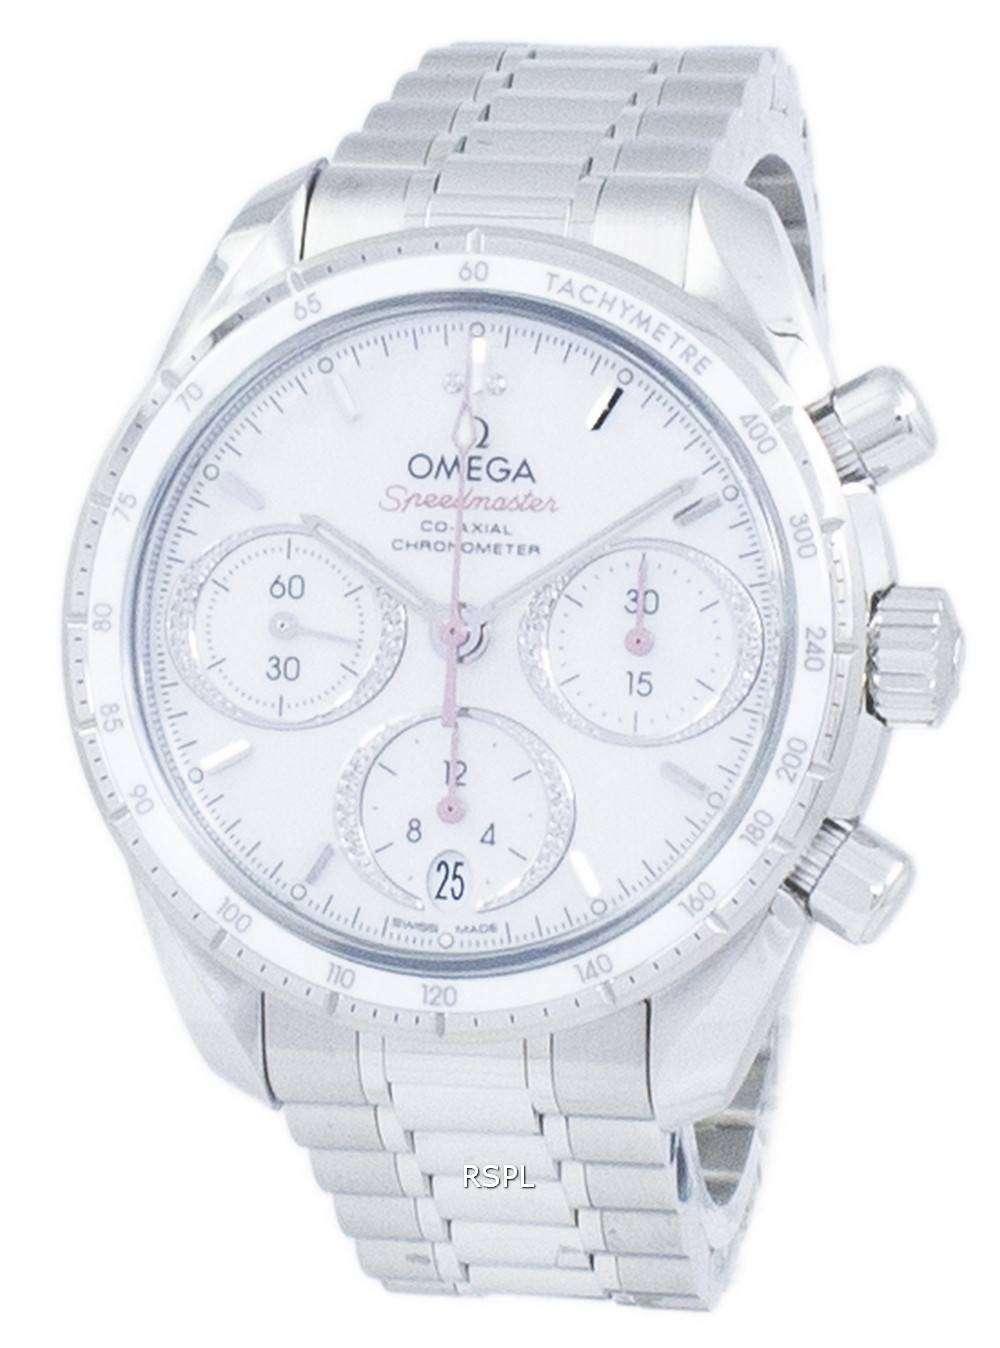 ea43cedaa48 Omega Speedmaster Co-Axial Chronograph Automatic 324.30.38.50.55.001 Men s  Watch